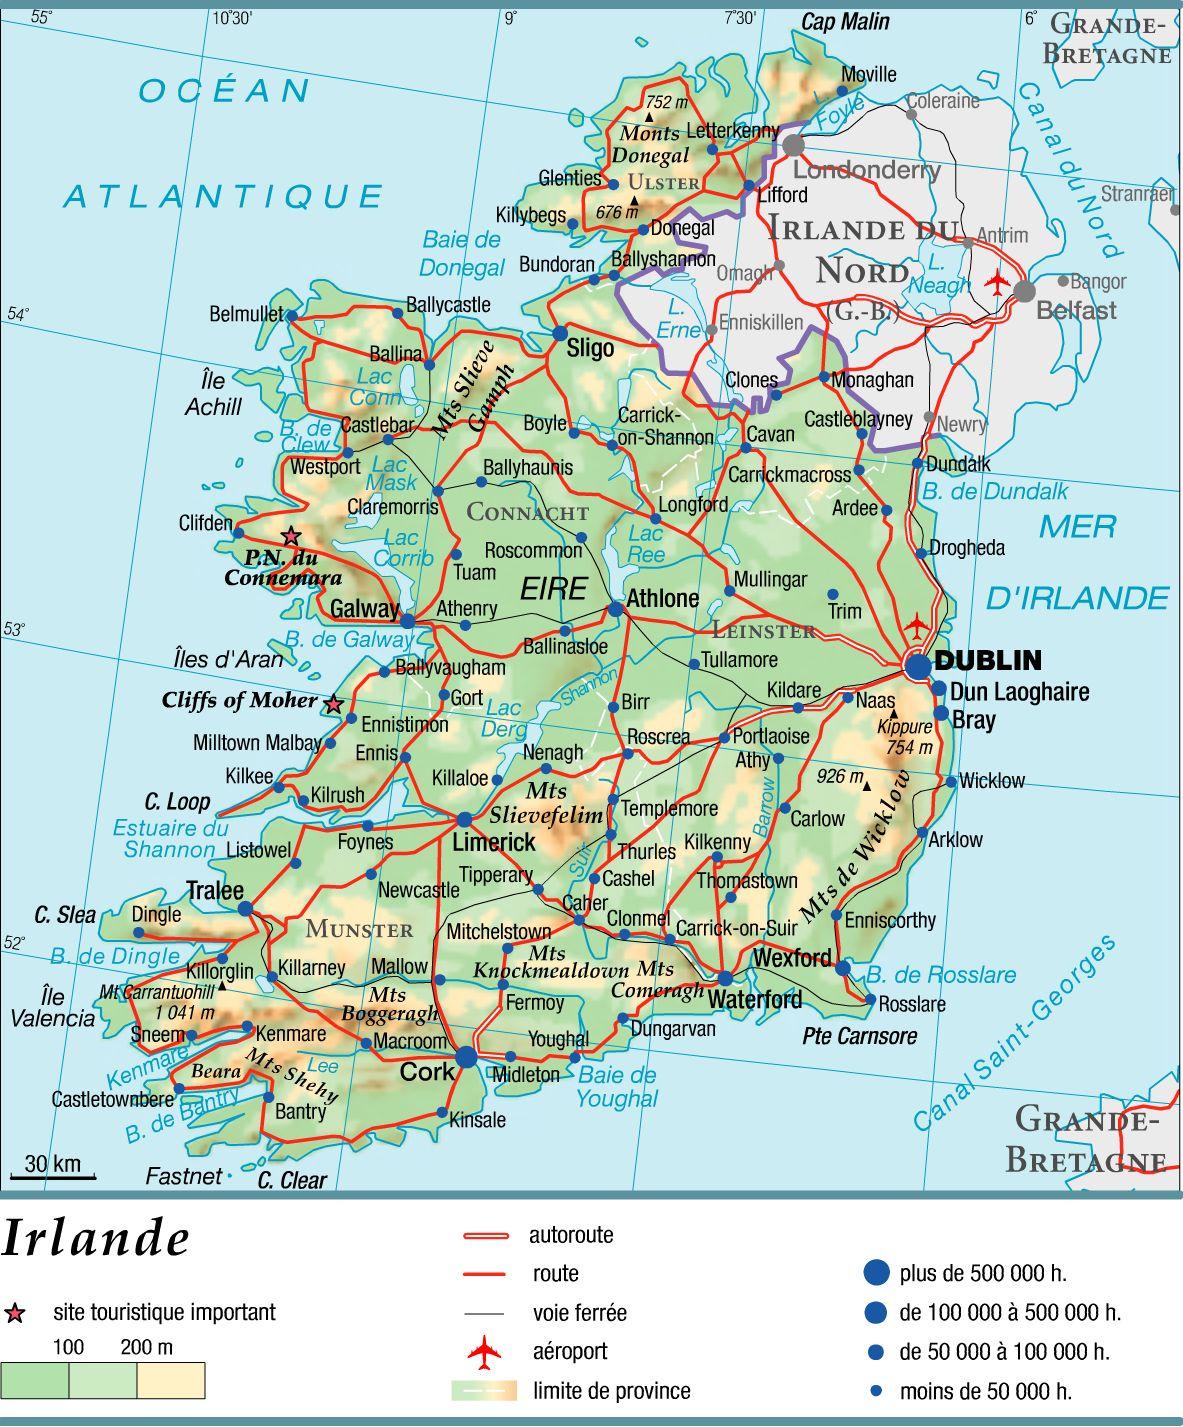 irlande-carte-des-villes